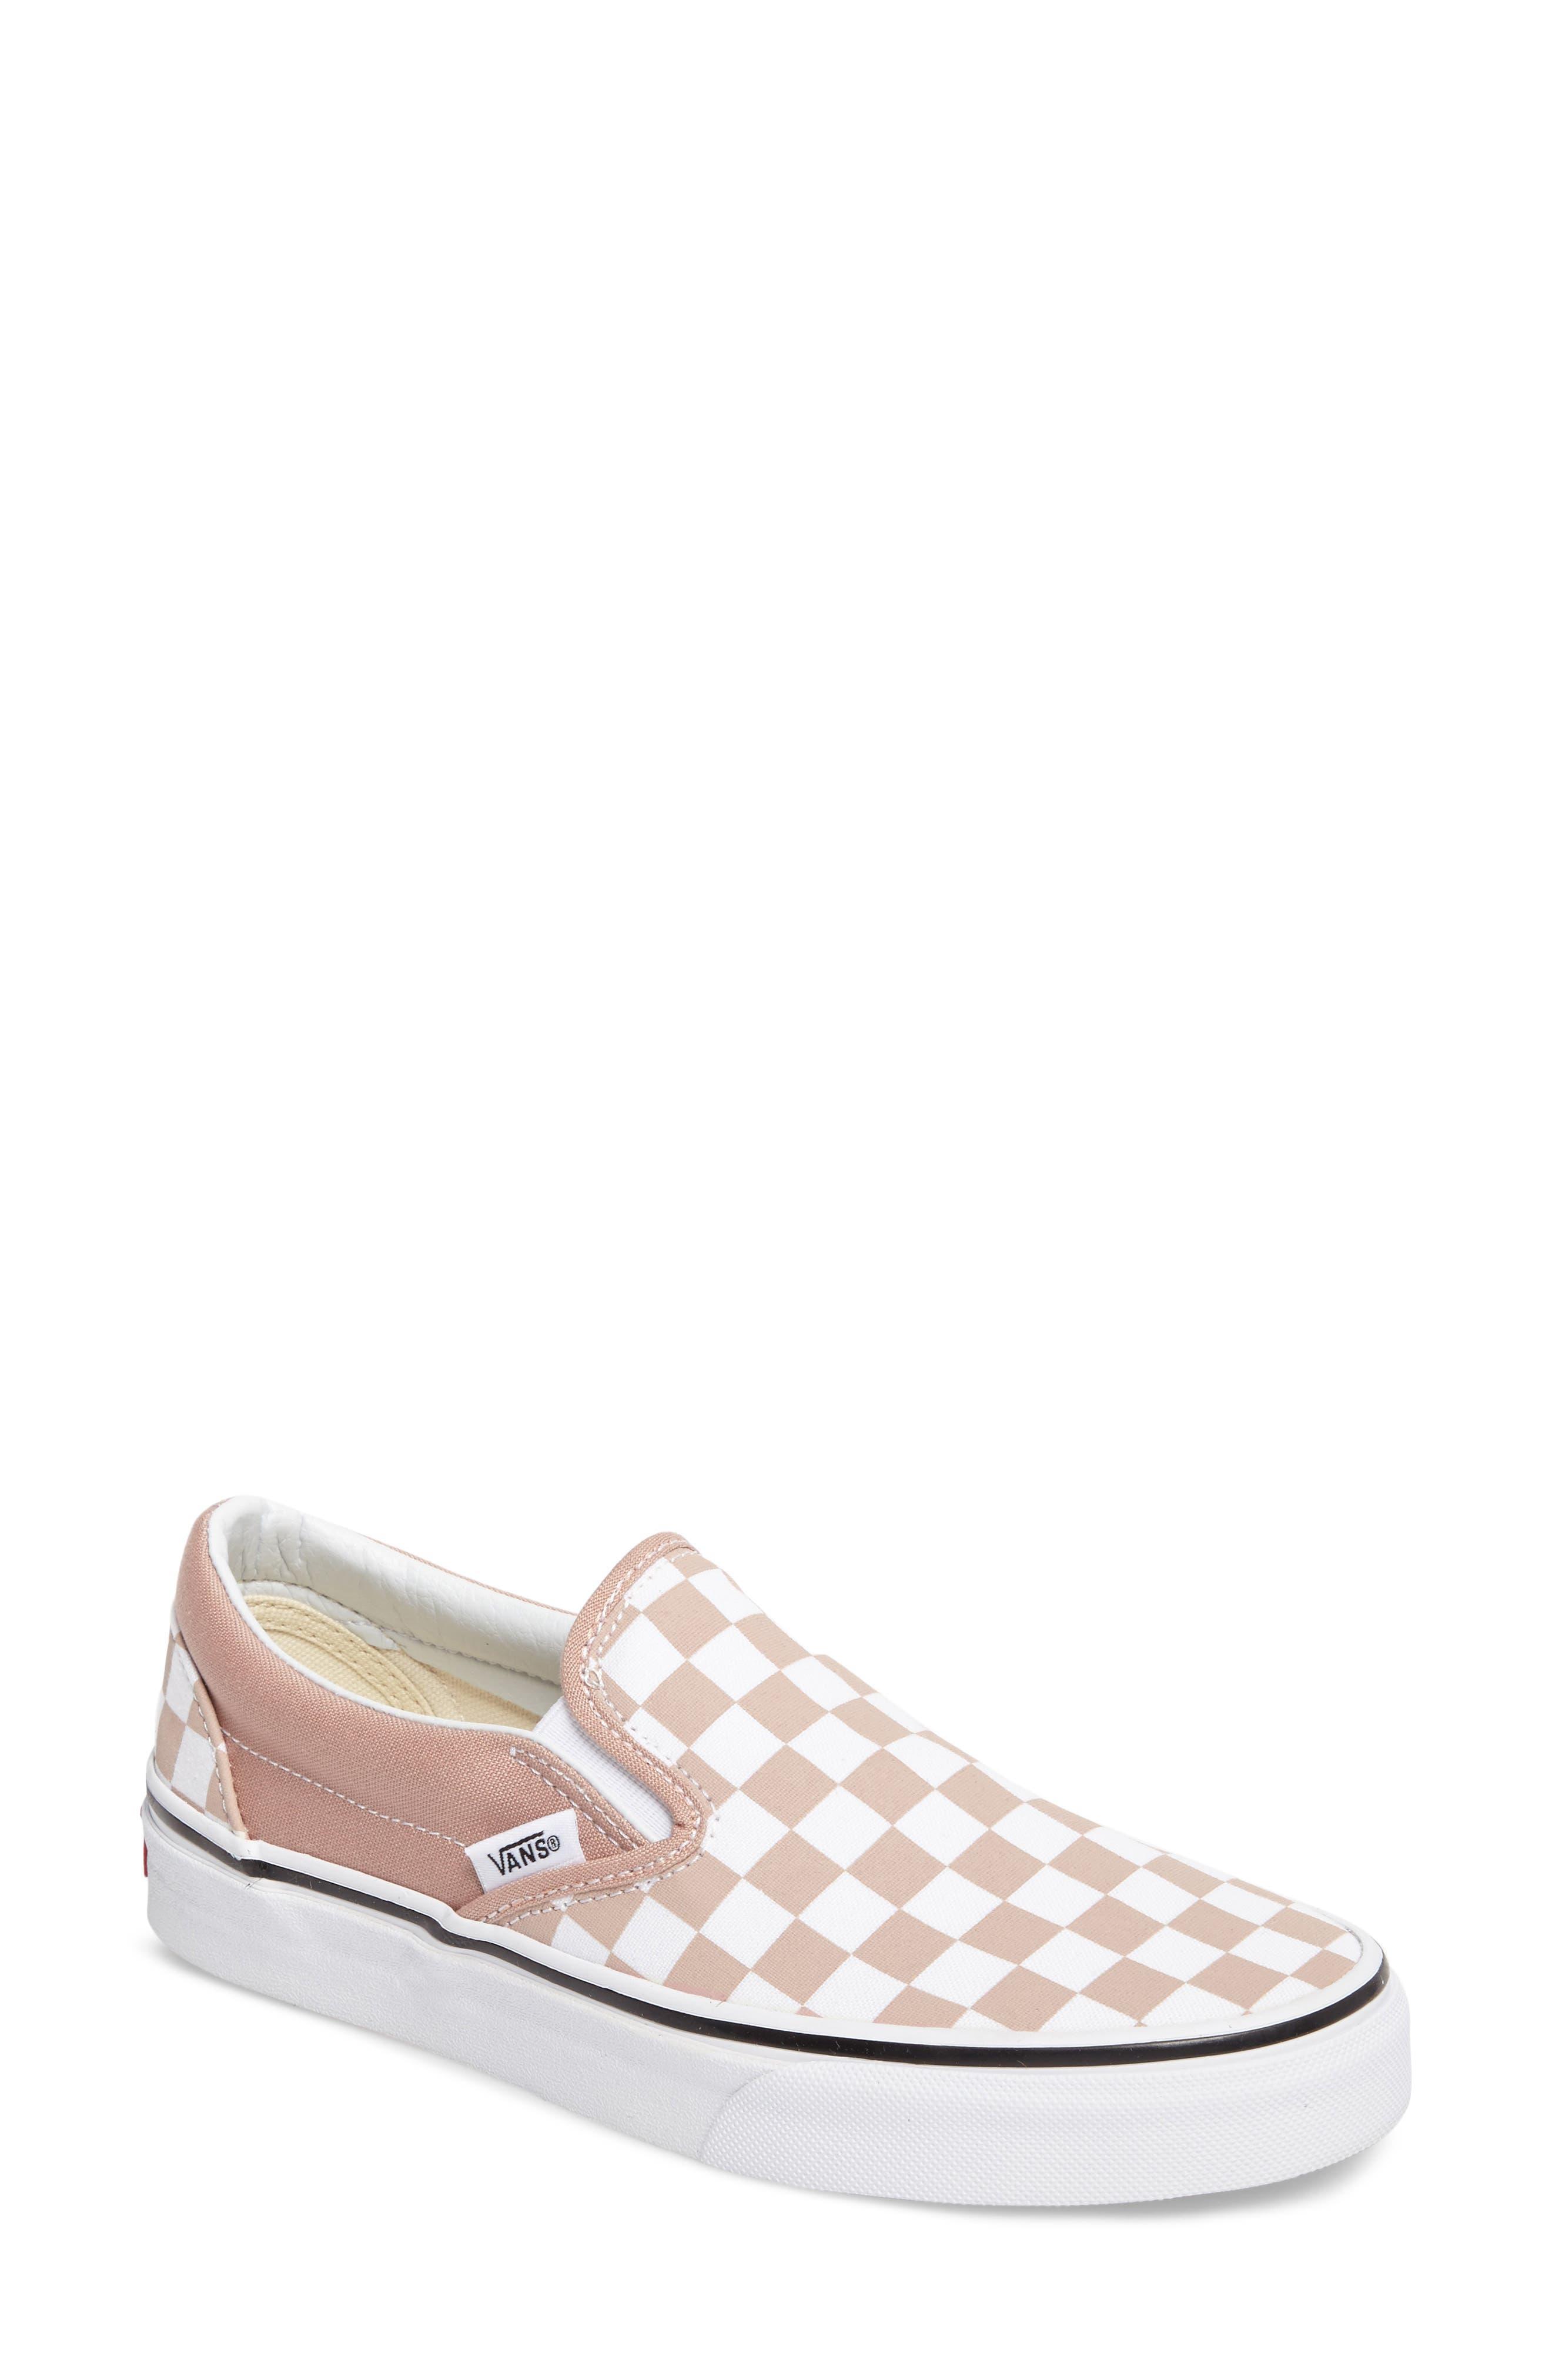 ,                             Classic Slip-On Sneaker,                             Main thumbnail 225, color,                             680